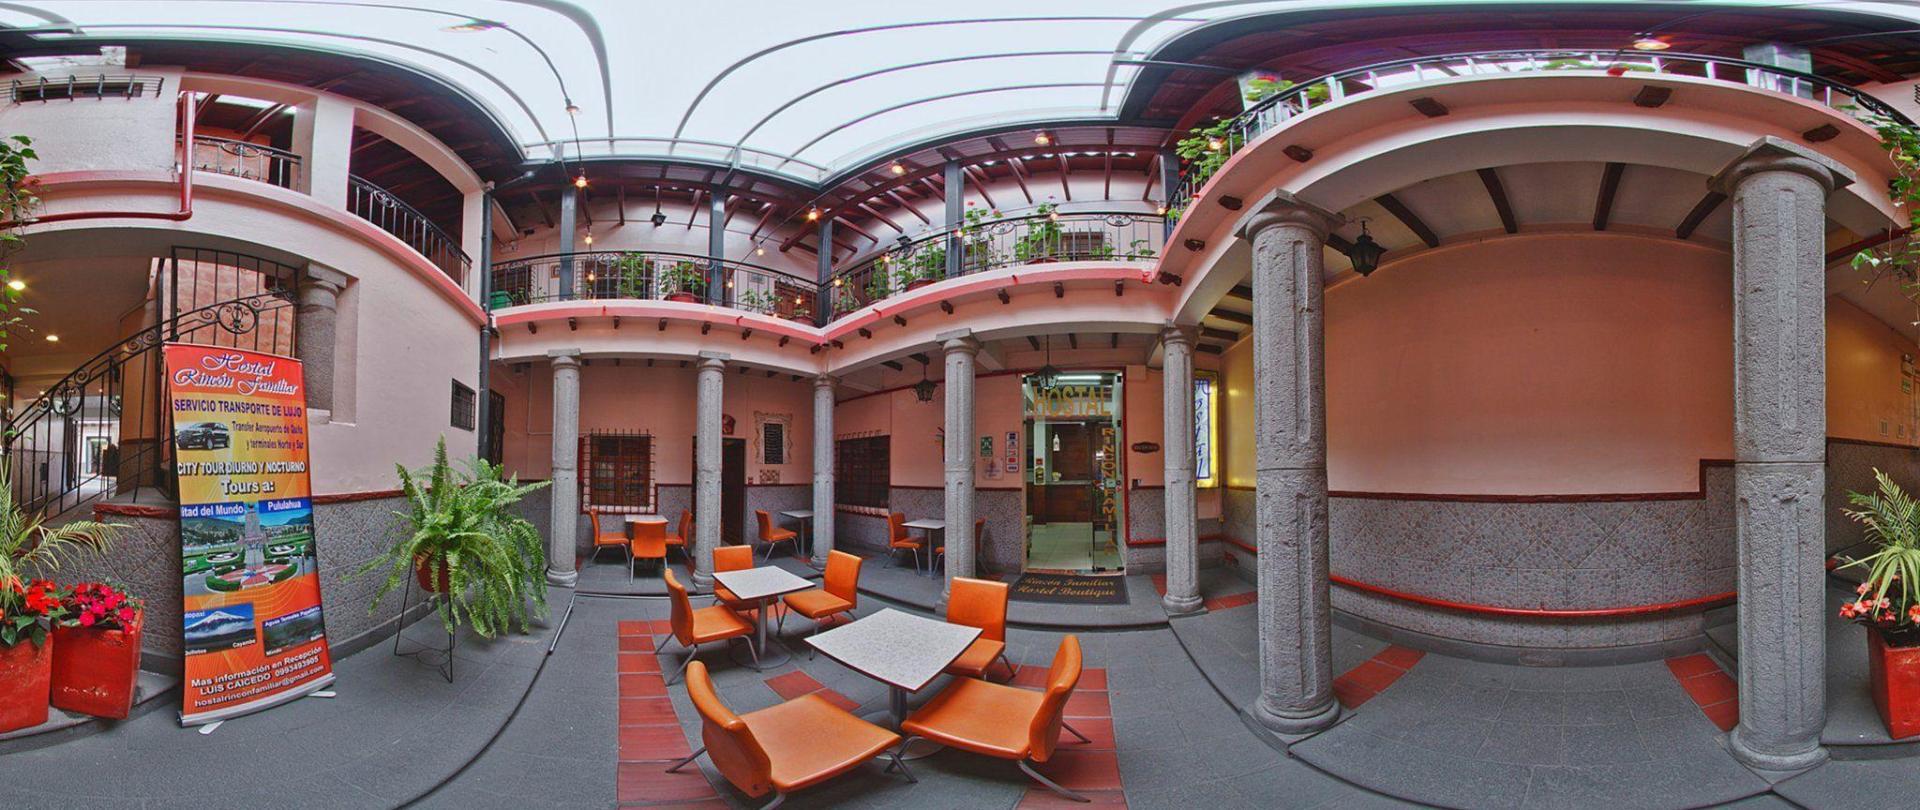 booking-quito-4-rincon-familiar-hostel.jpg